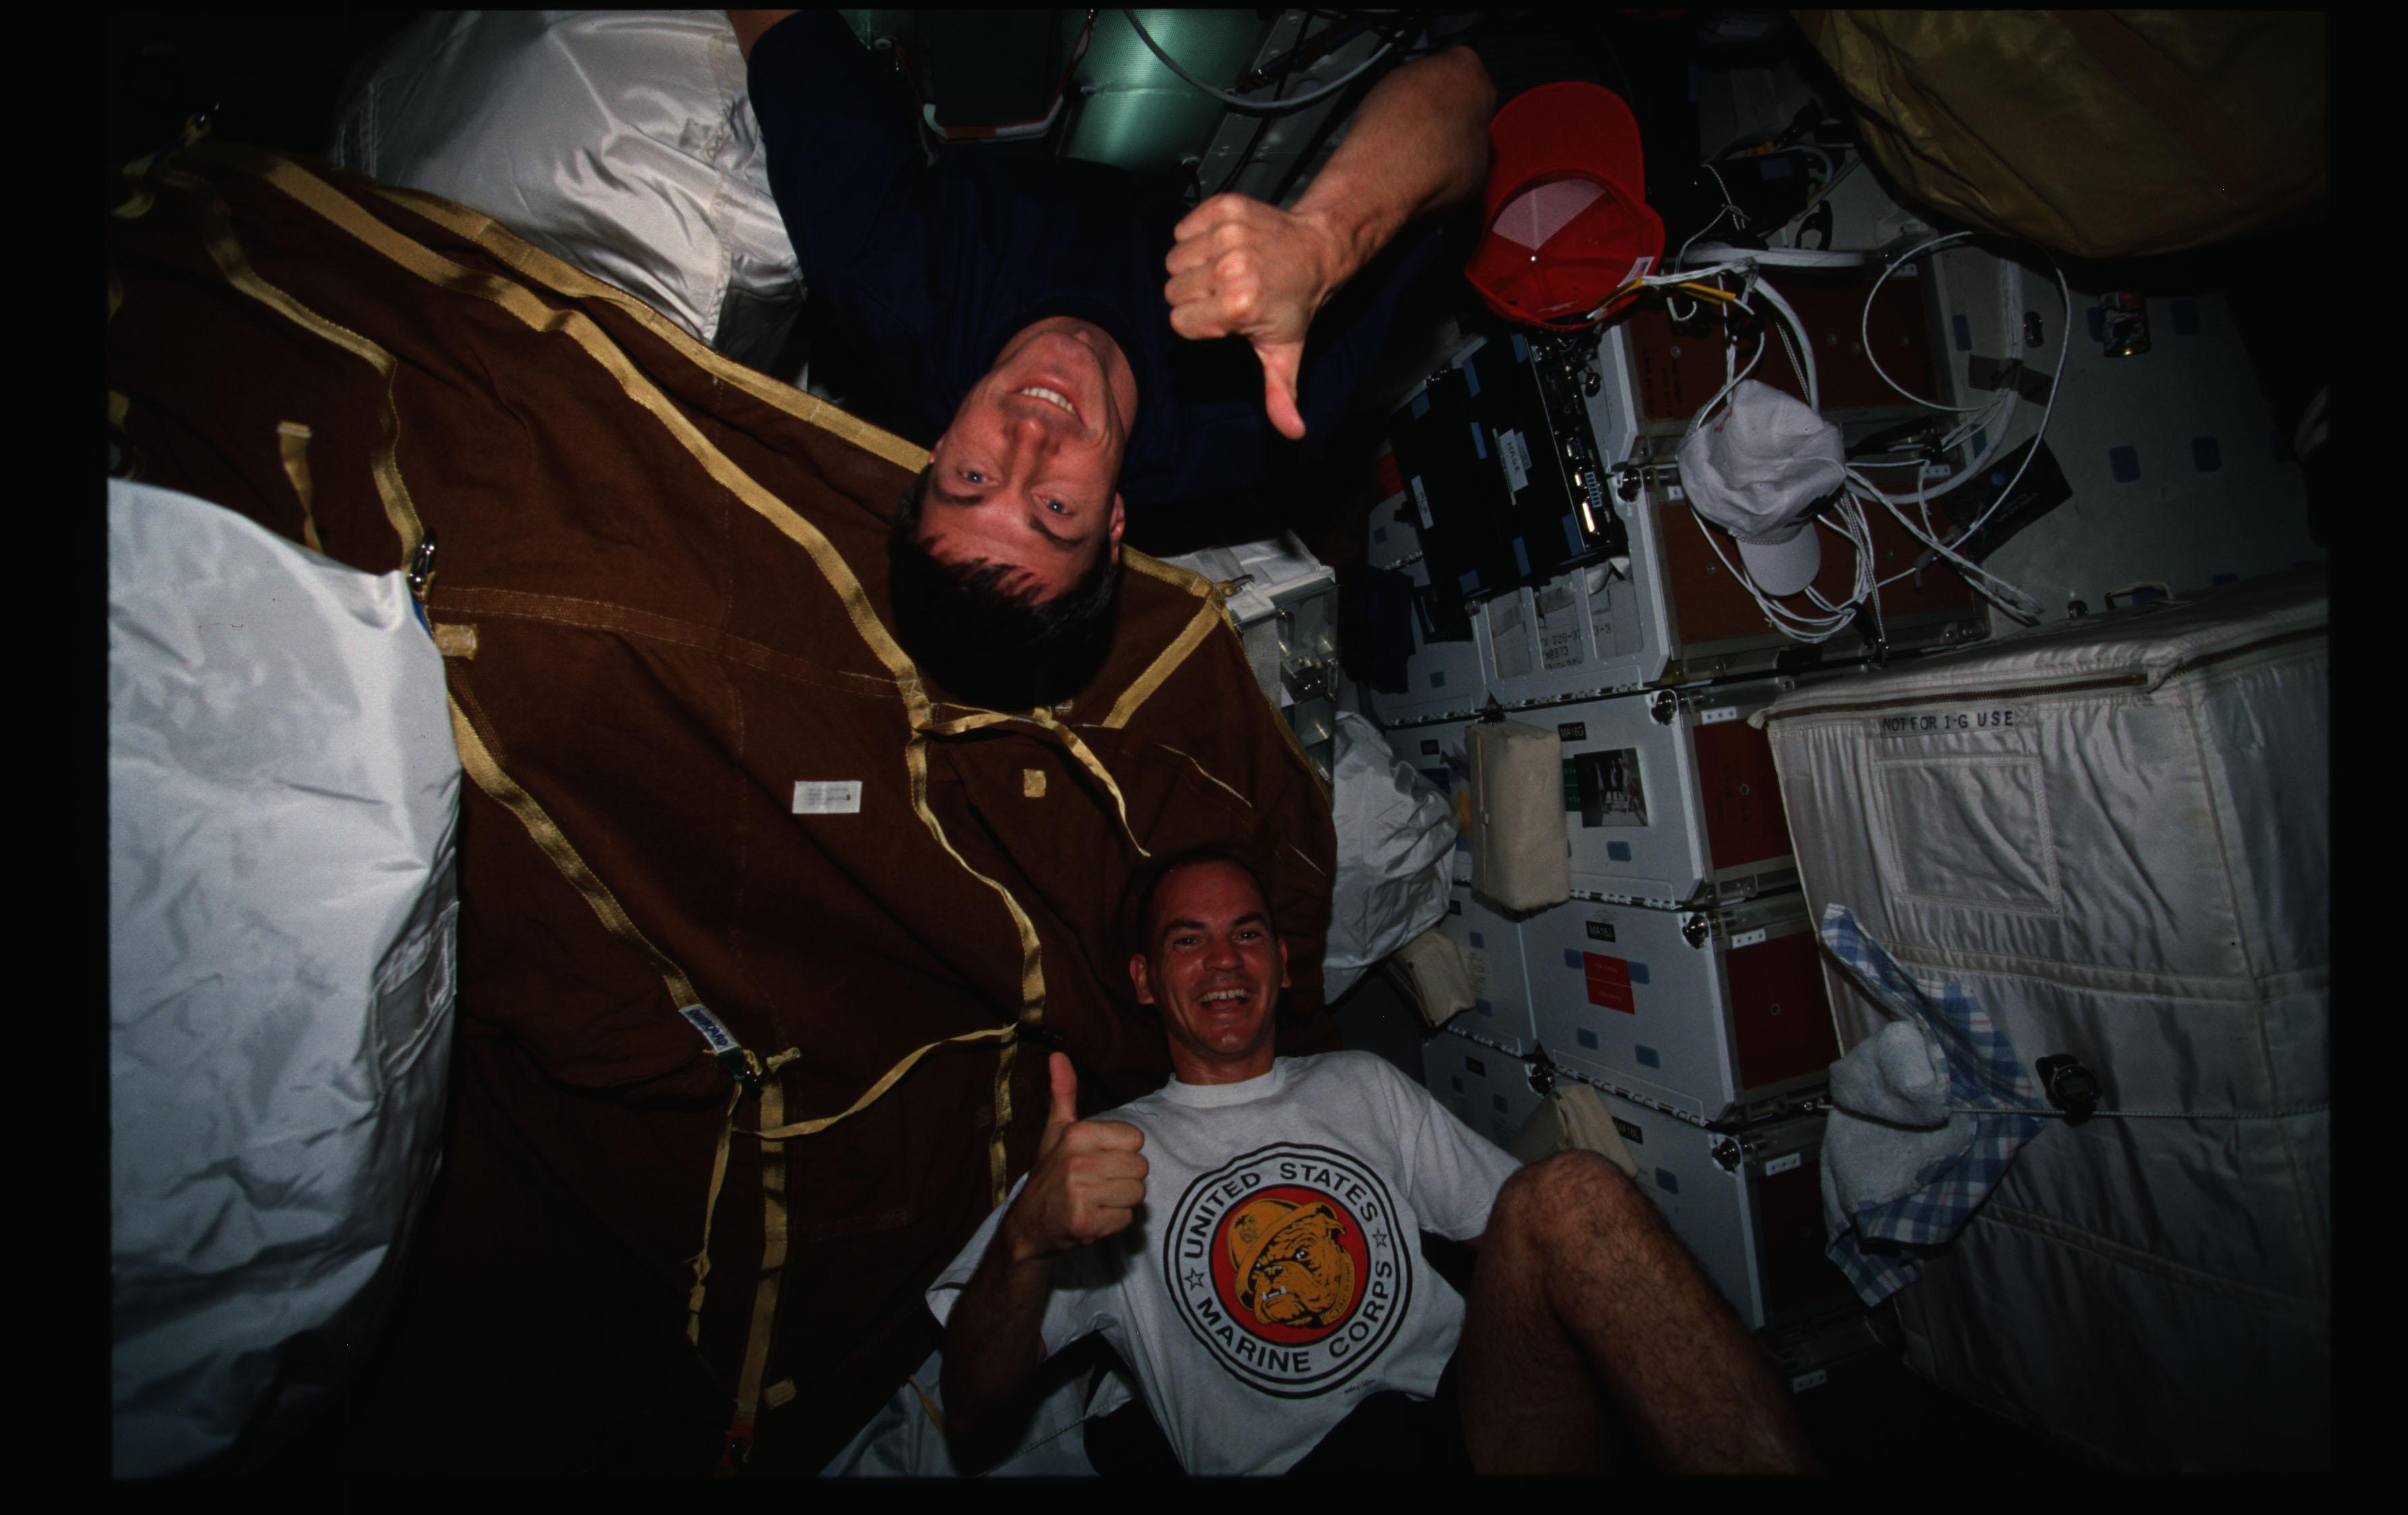 STS088-307-029 - STS-088 - Sturckow and Krikalev on middeck